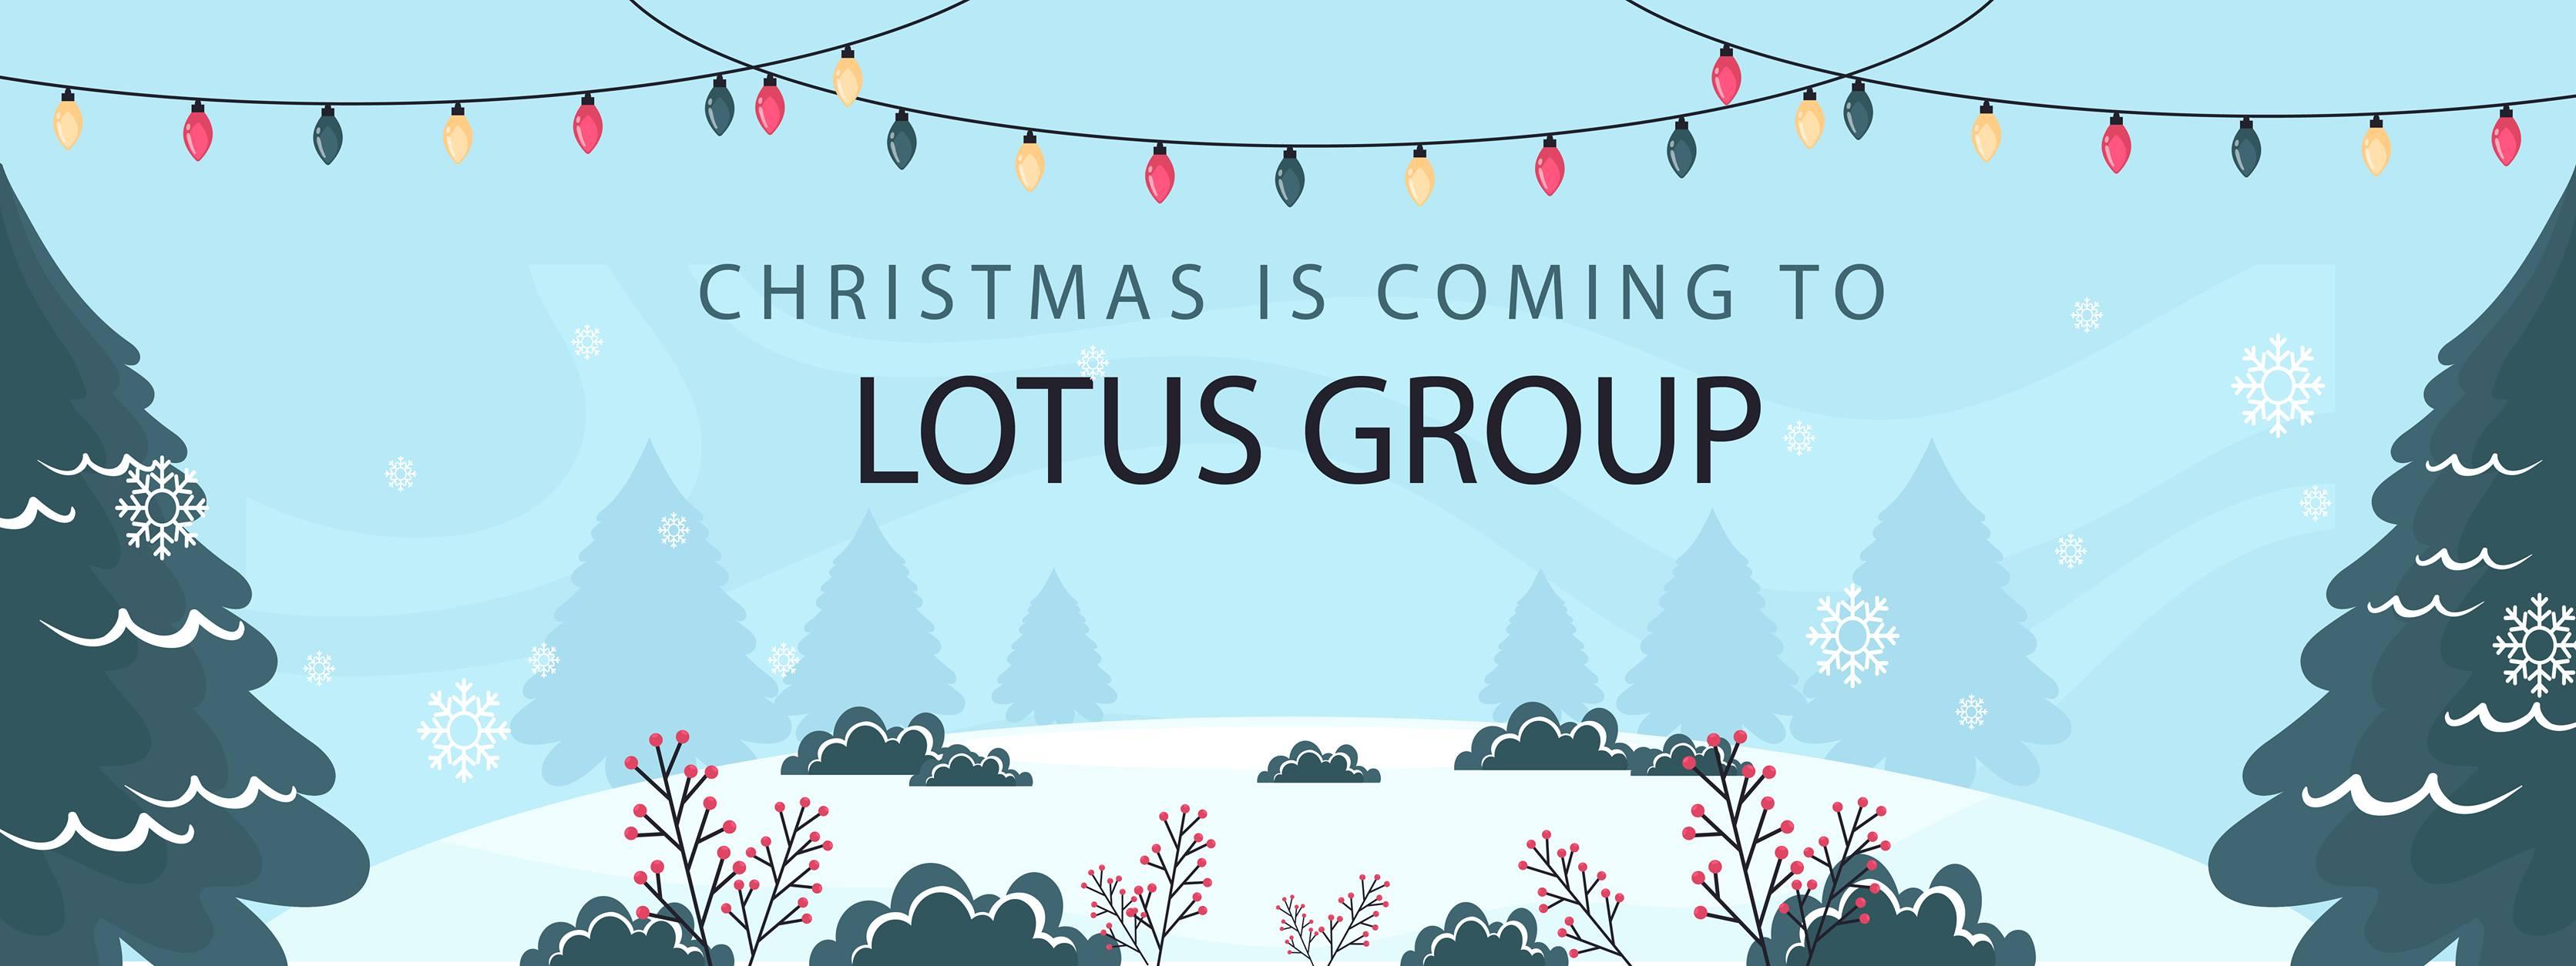 Báo Cánh Sen - Nội San Lotus Group